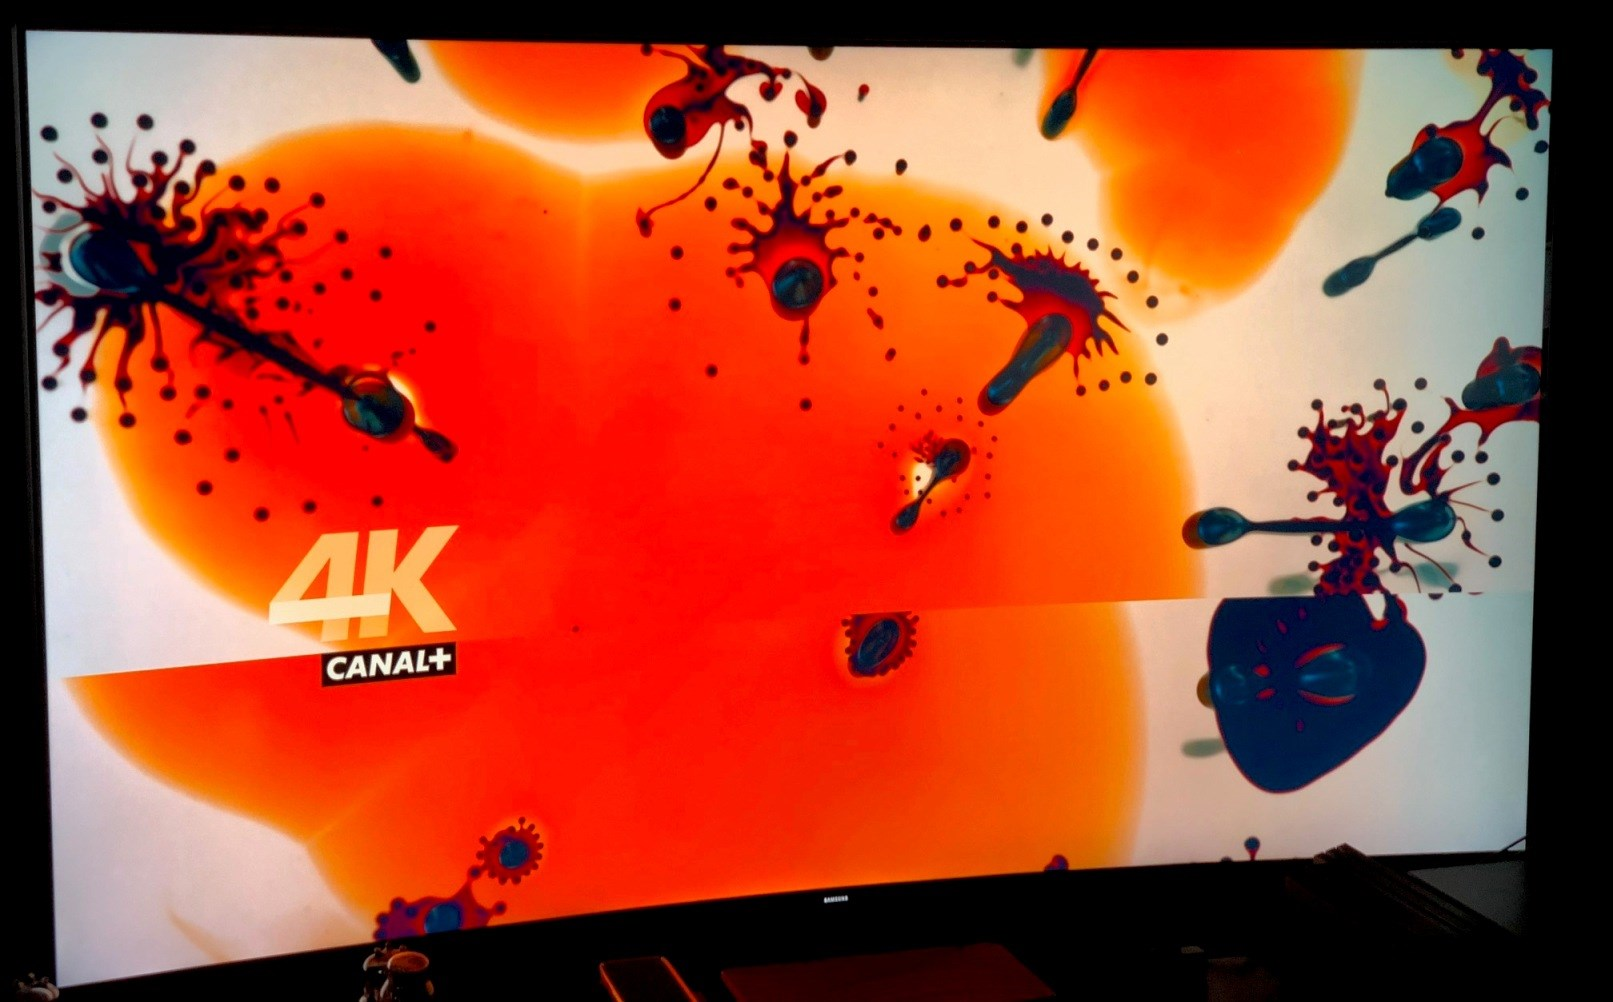 Canal+ 4K Ultra HD już dostępny na dekoderach nc+!